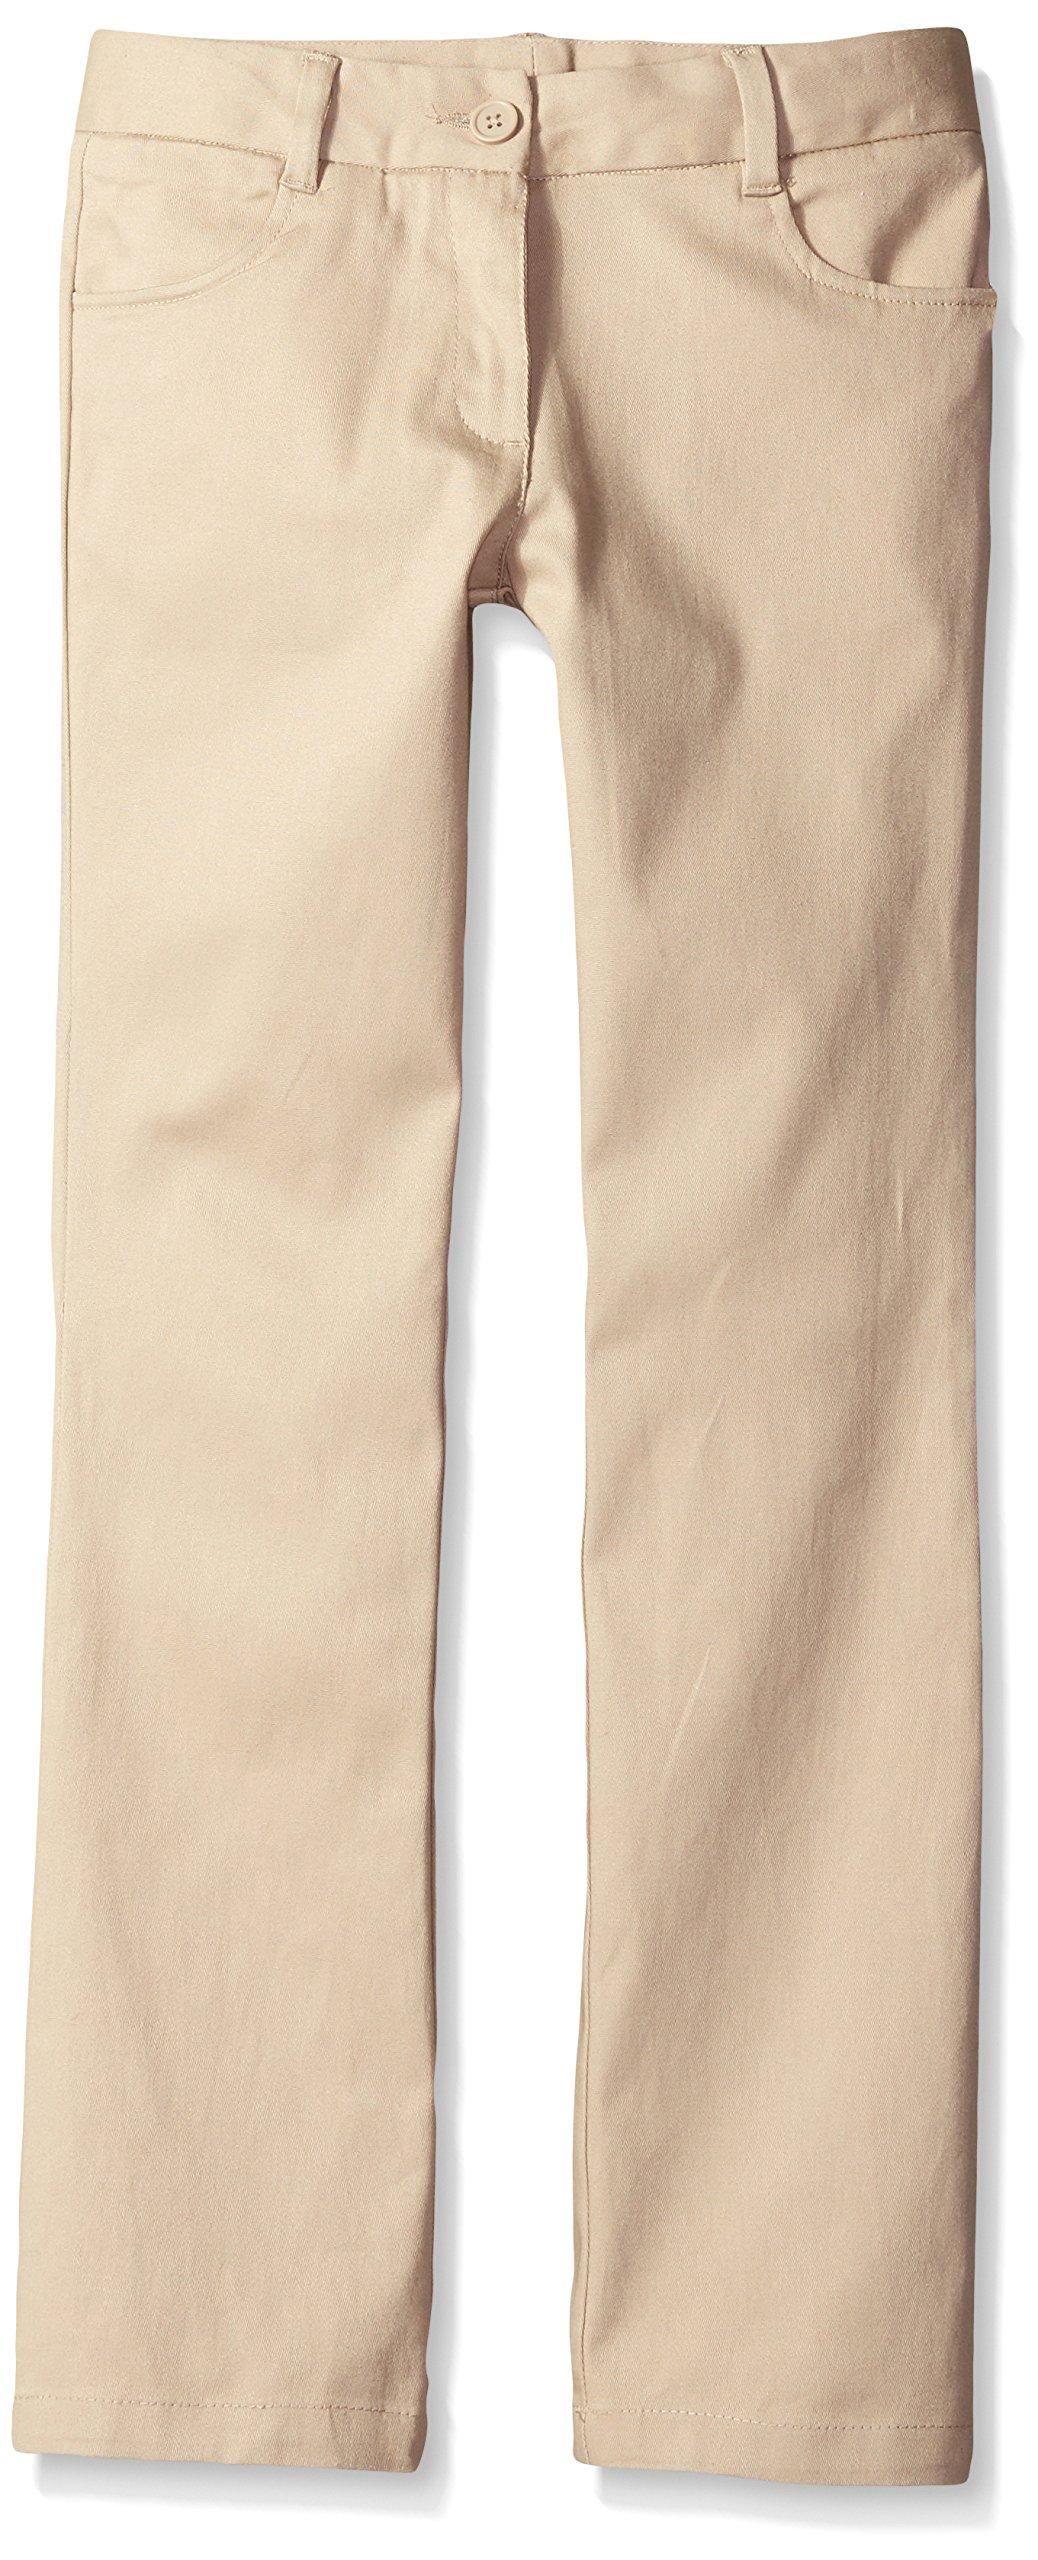 Nautica  Girls' Uniform Bootcut Twill Pant, Khaki, 18.5 Plus